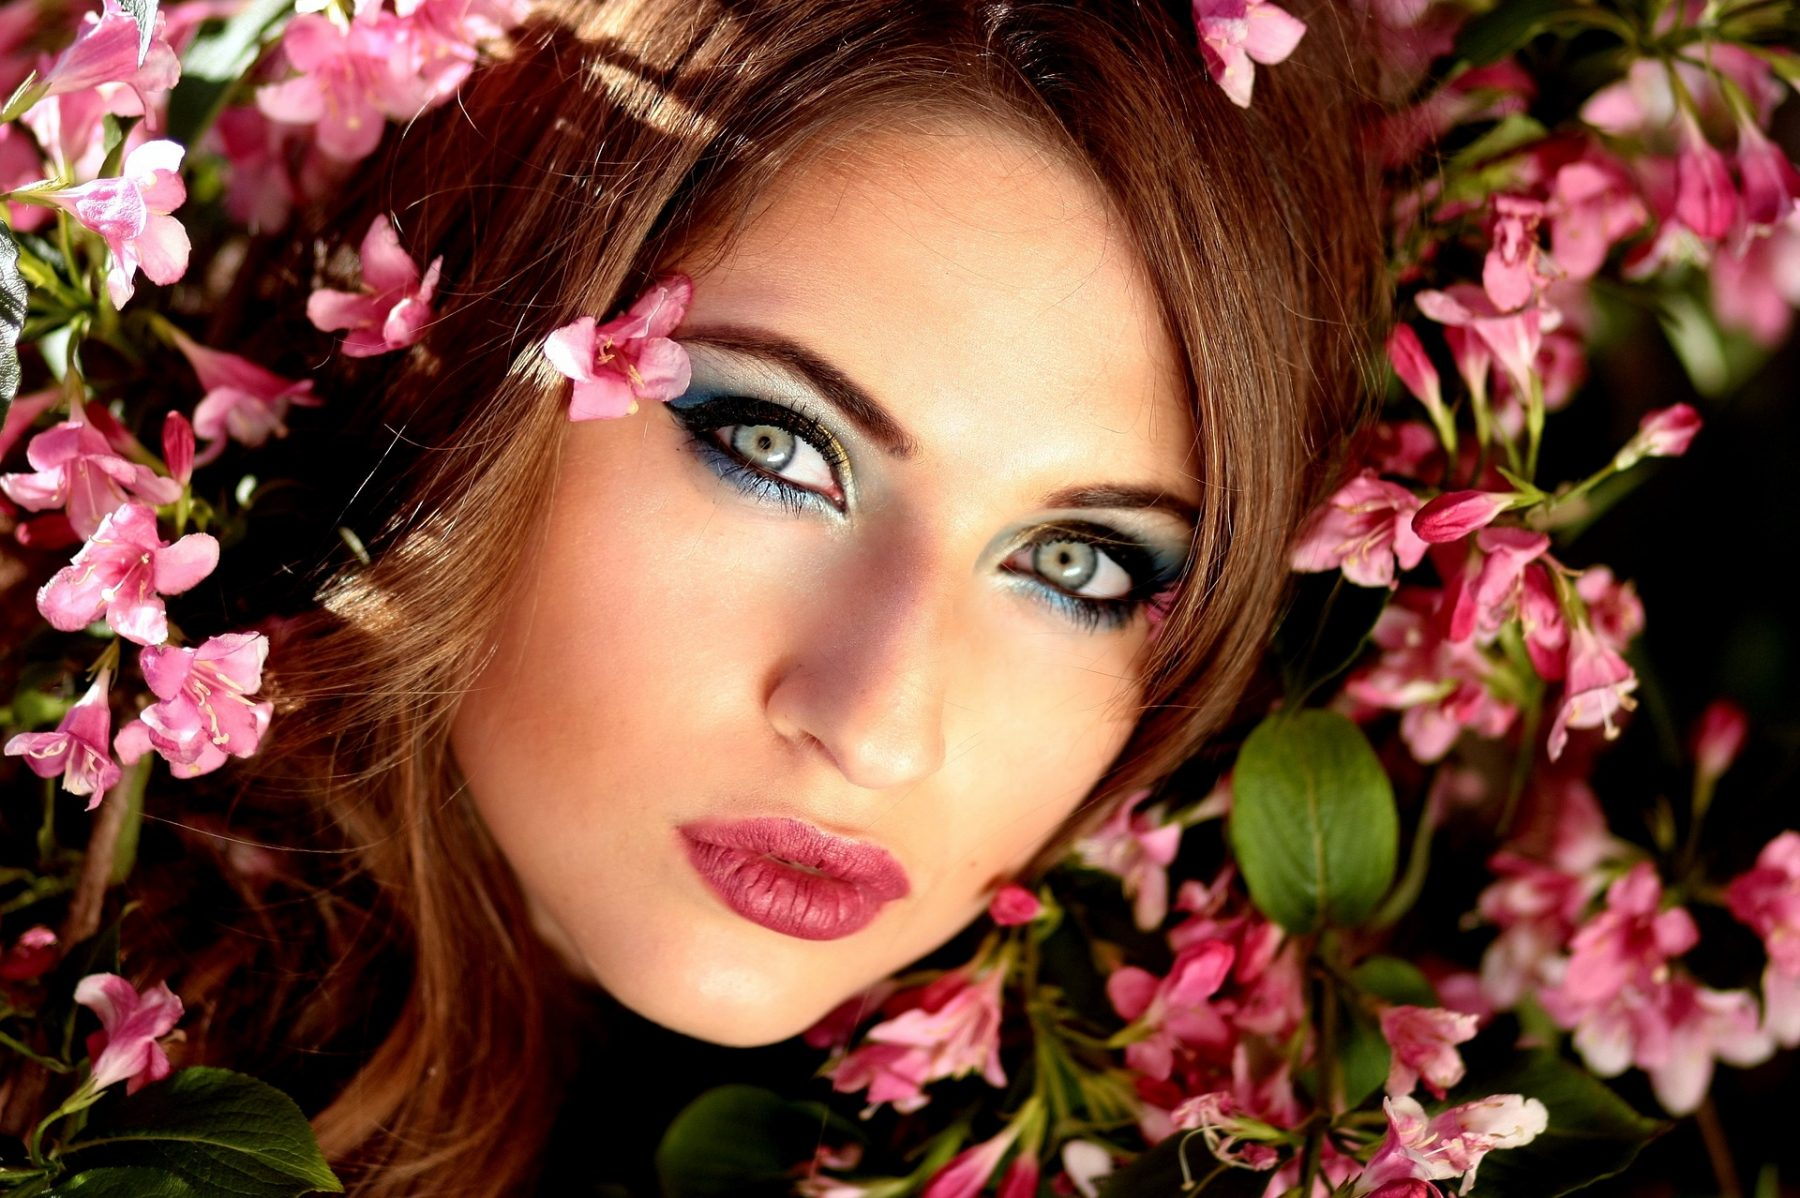 Makeup προϊόντα ψυγείο: Τι πρέπει να διατηρείται στο ψυγείο από το μακιγιάζ σας & όχι στο νεσεσέρ;